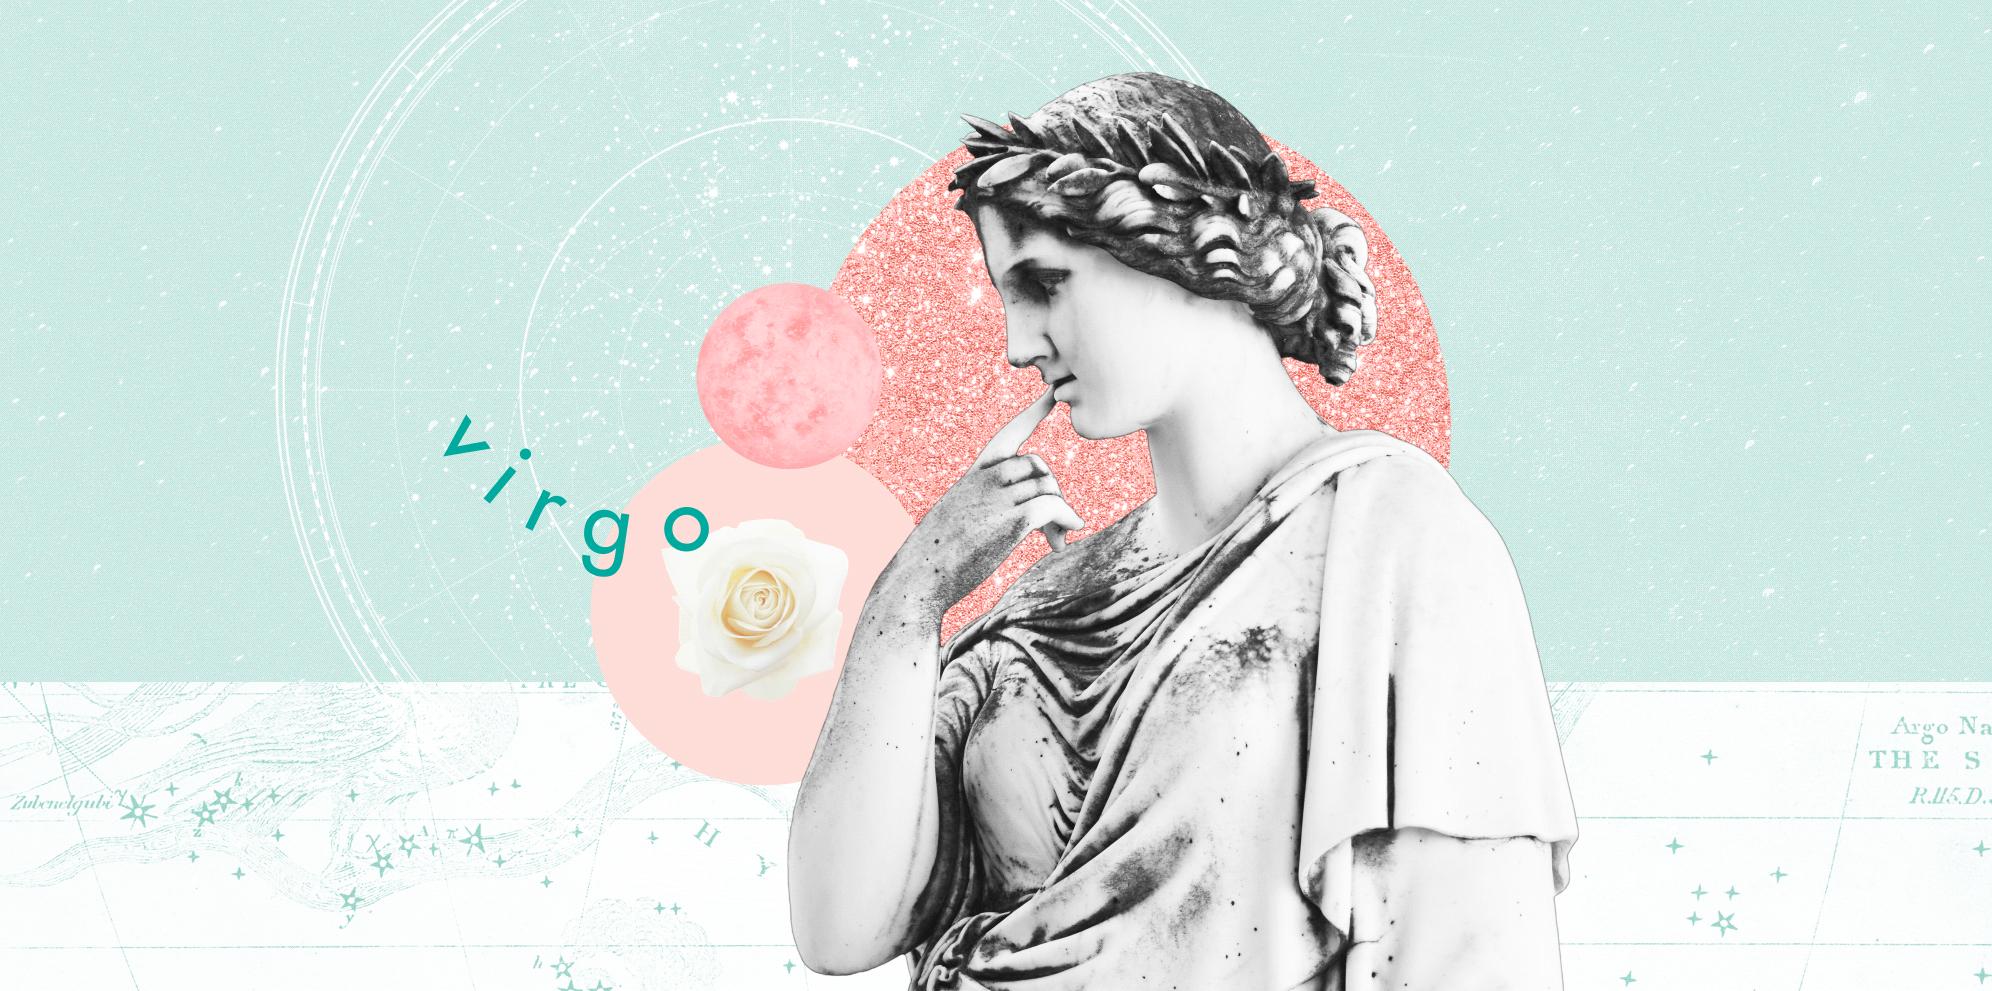 cosmo horoscope march 27